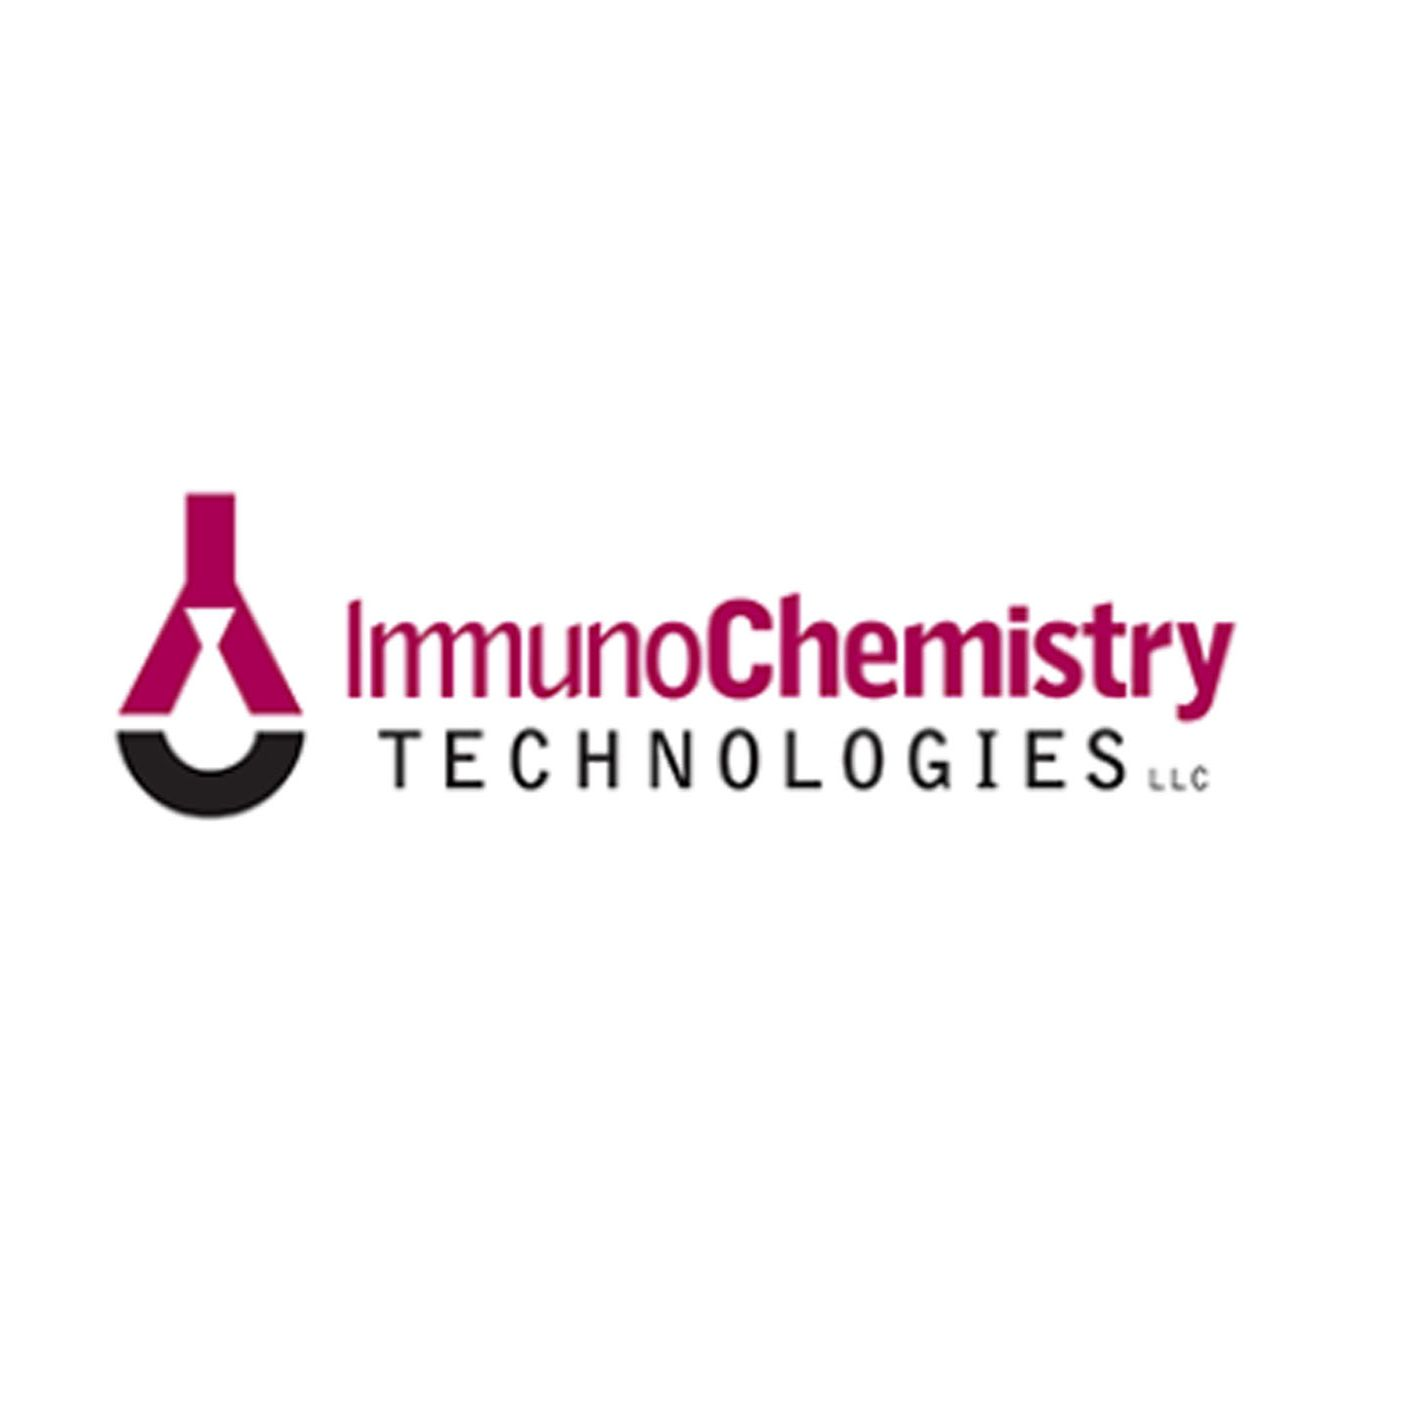 ImmunoChemistry Technologies(ICT)9105 MitoPT TMRM Assay,500 Tests,现货